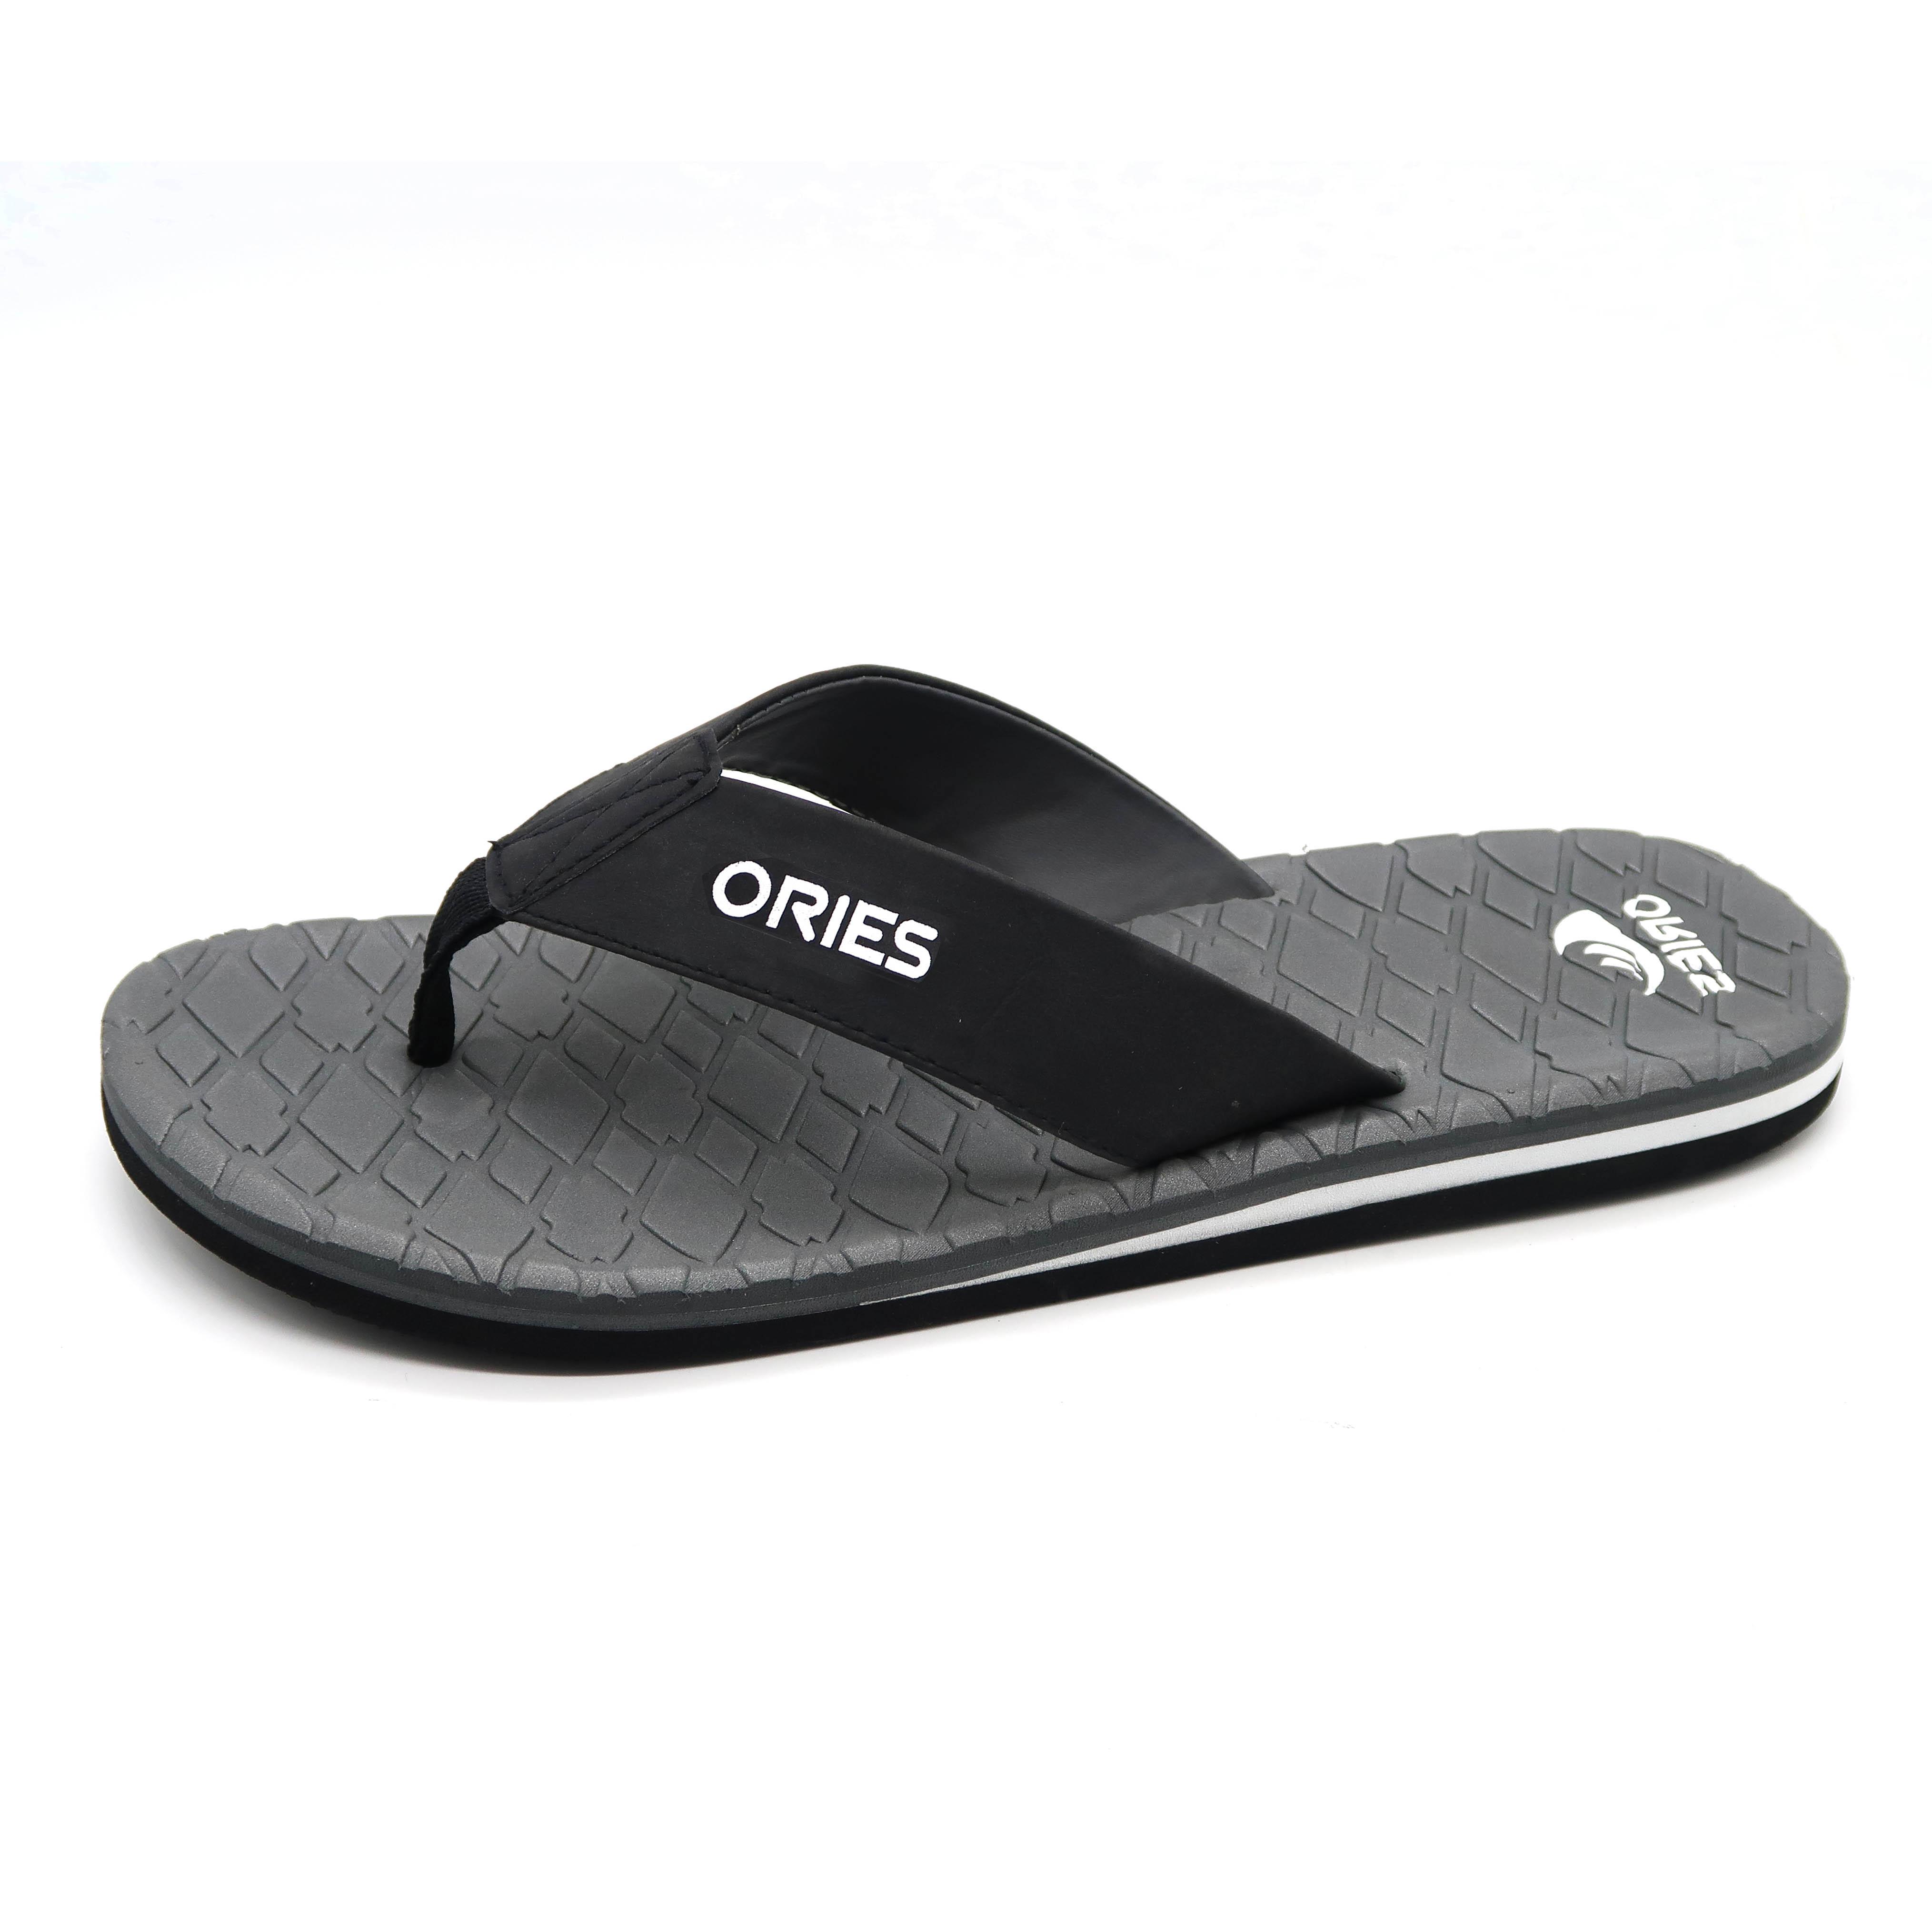 9ee109f76e42 China comfortable flip flops slippers wholesale 🇨🇳 - Alibaba